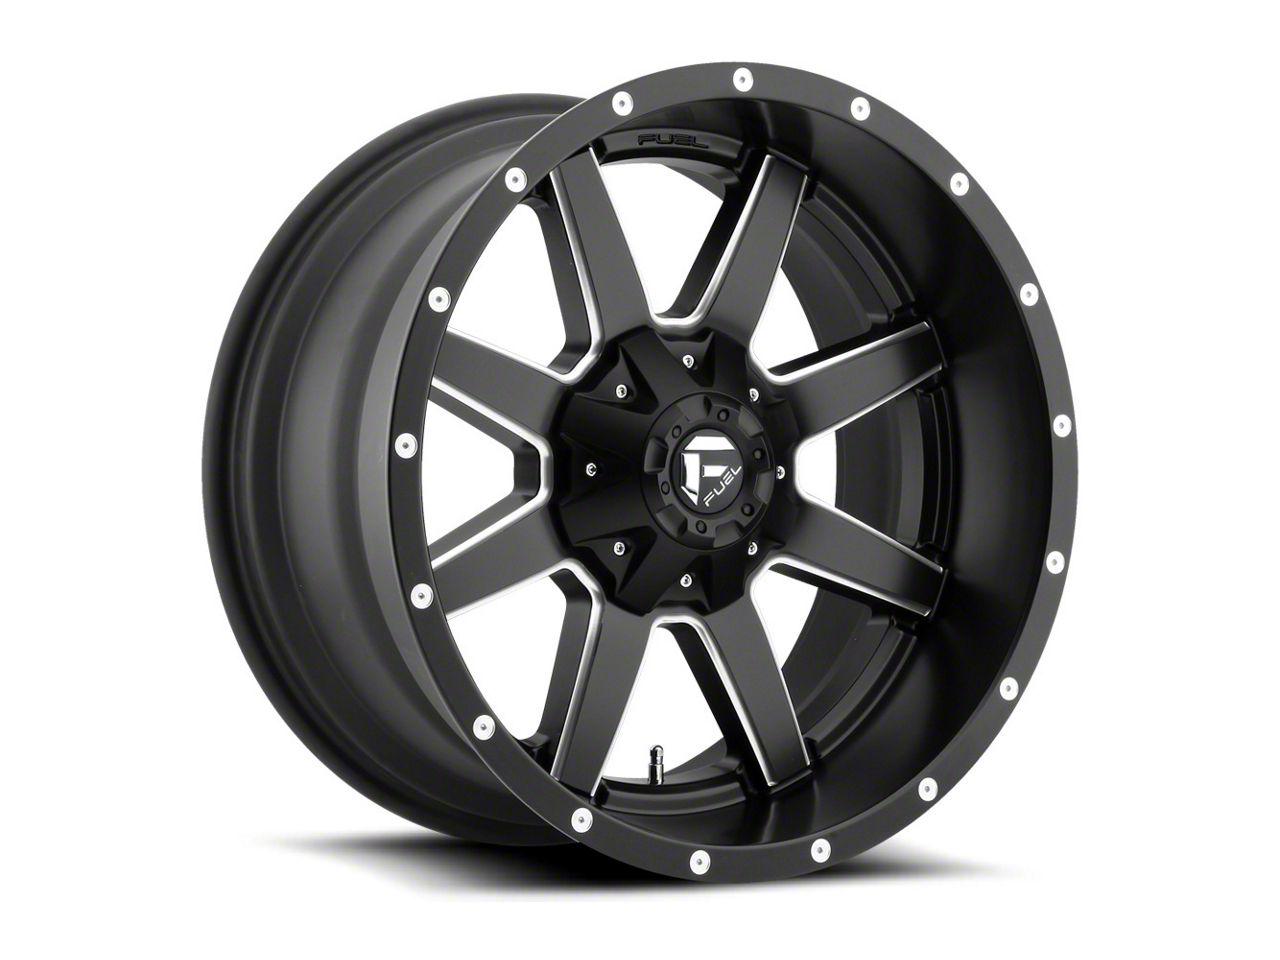 Fuel Wheels Maverick Black Milled 5-Lug Wheel - 20x12 (02-18 RAM 1500, Excluding Mega Cab)